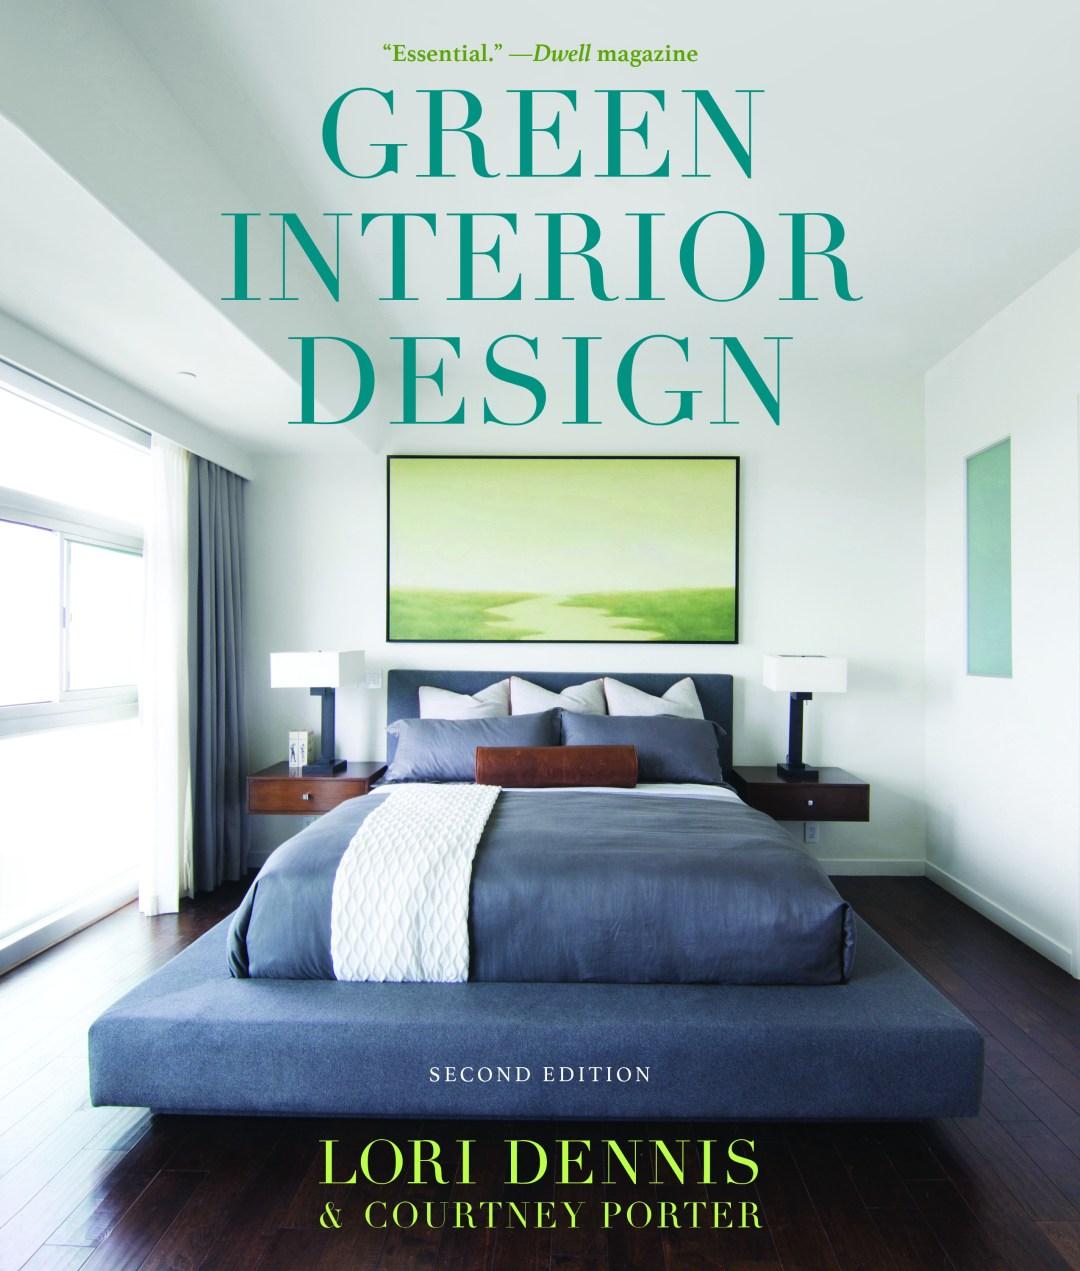 Green Interior Design by Courtney Porter and Lori Dennis